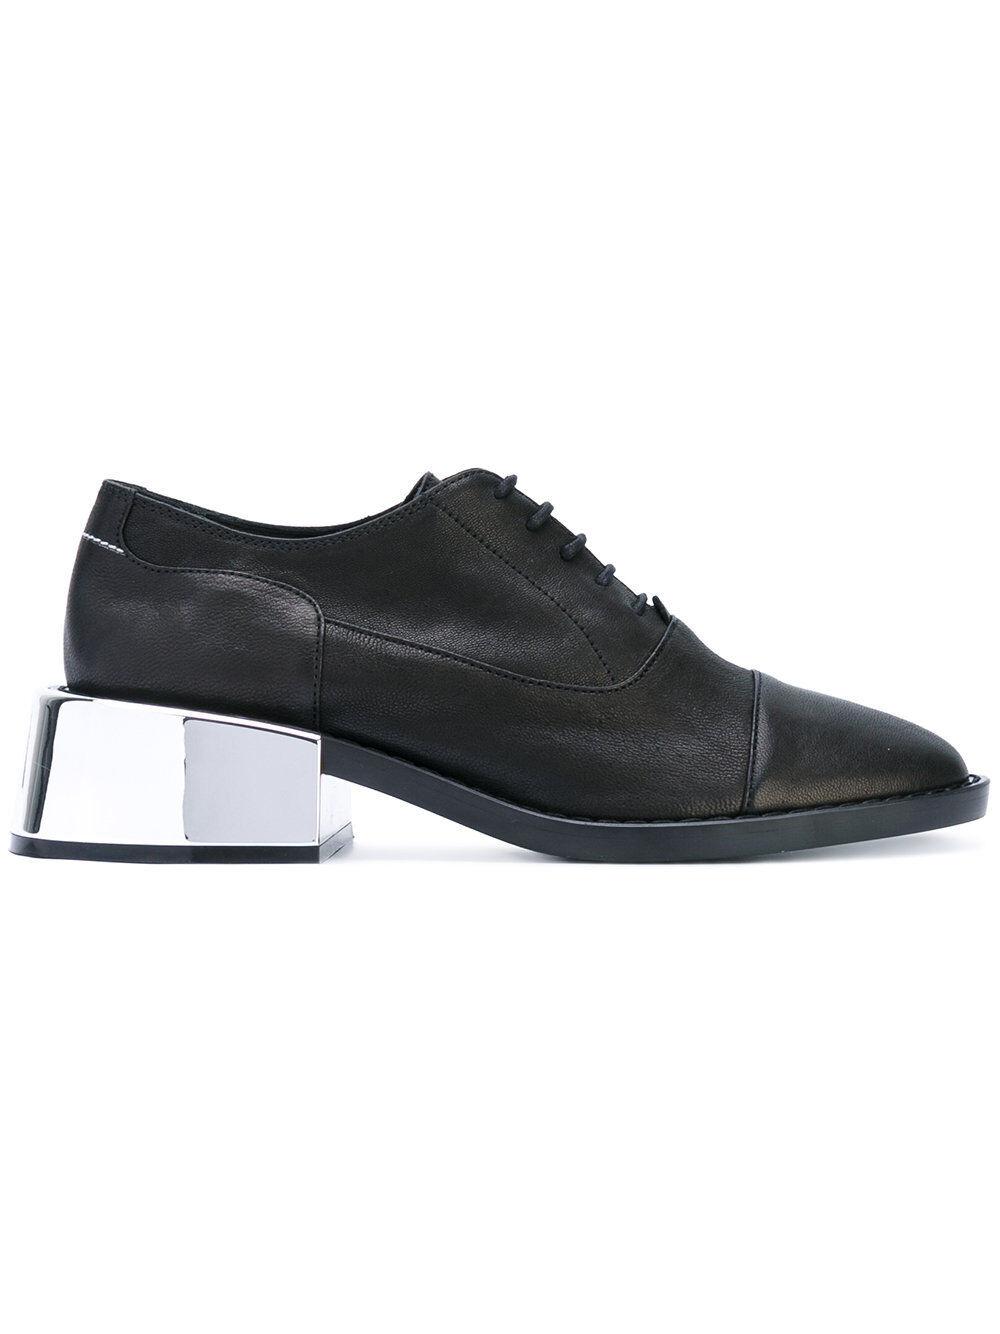 NEW maison martin margiela S40WQ0040 metallic heel lace-up chaussures noir